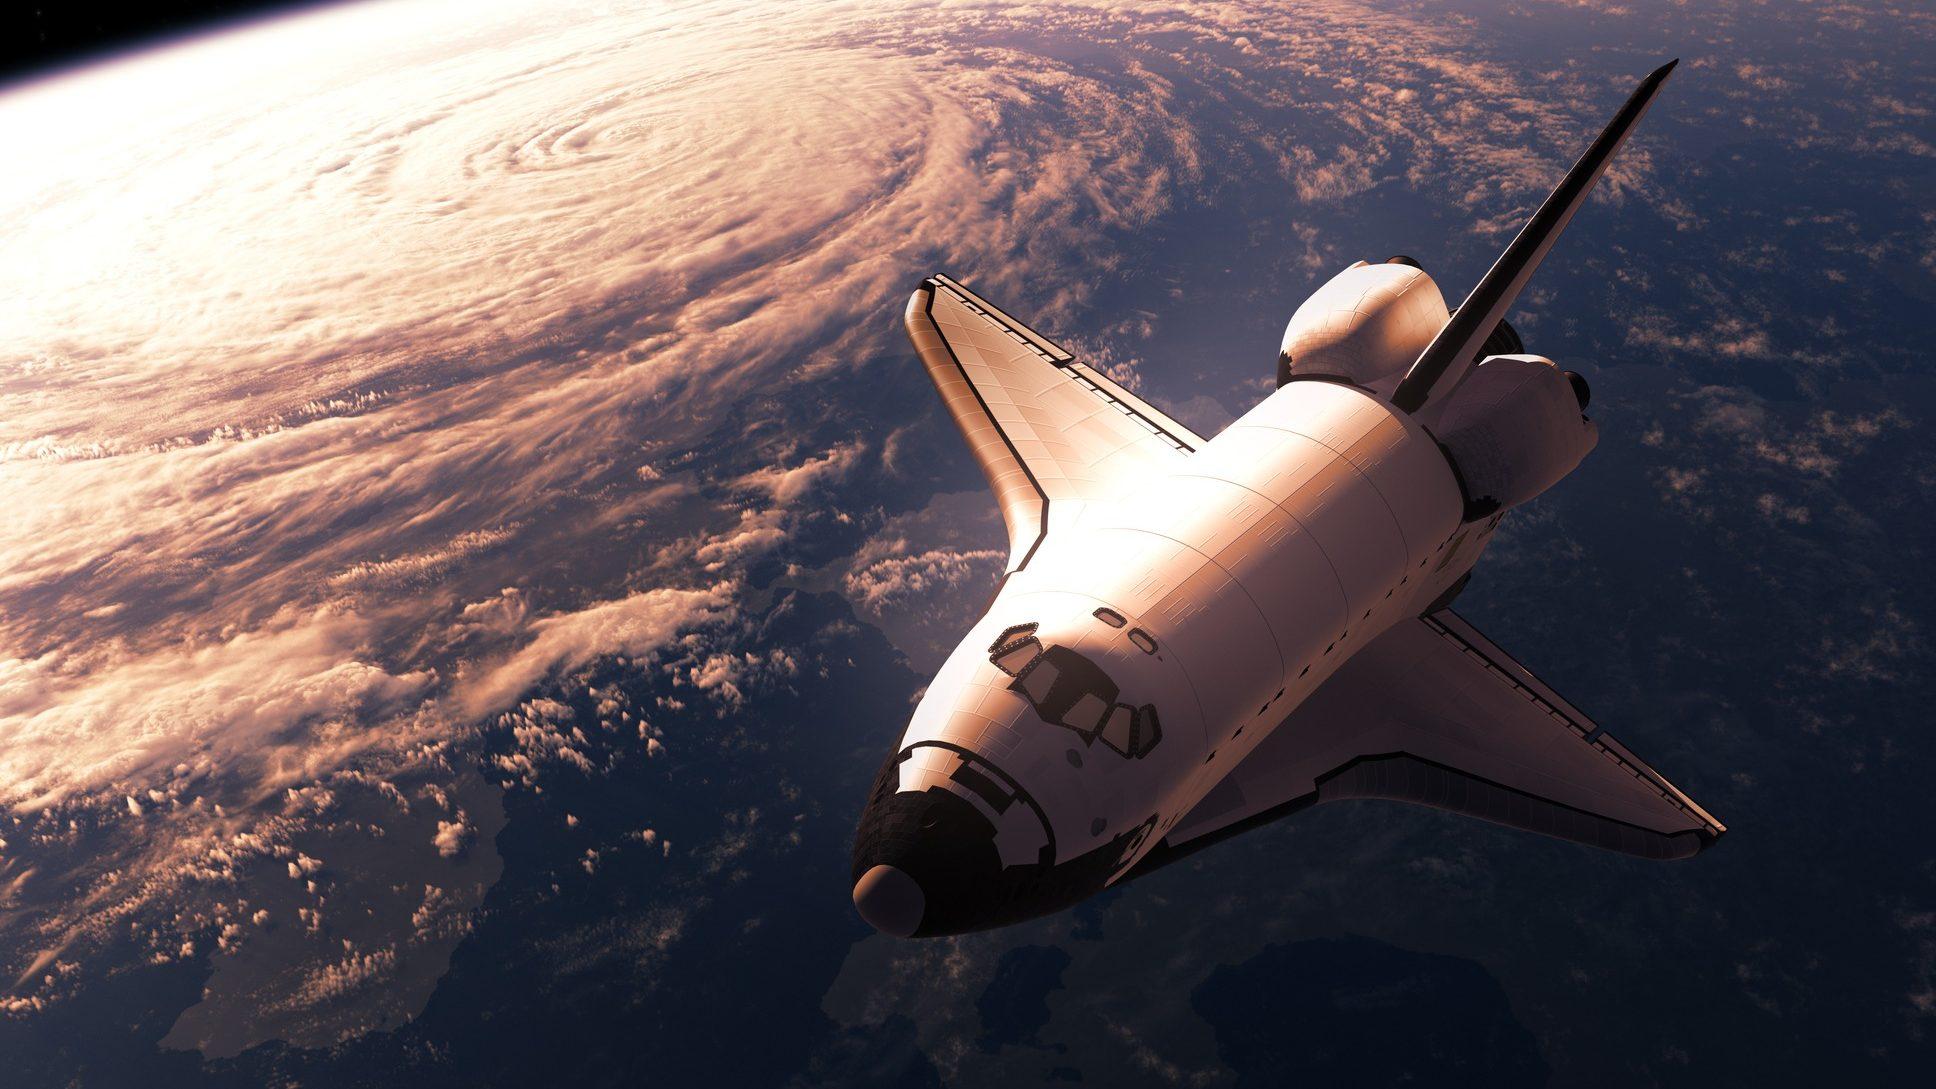 Space plane X-37B / USA-212